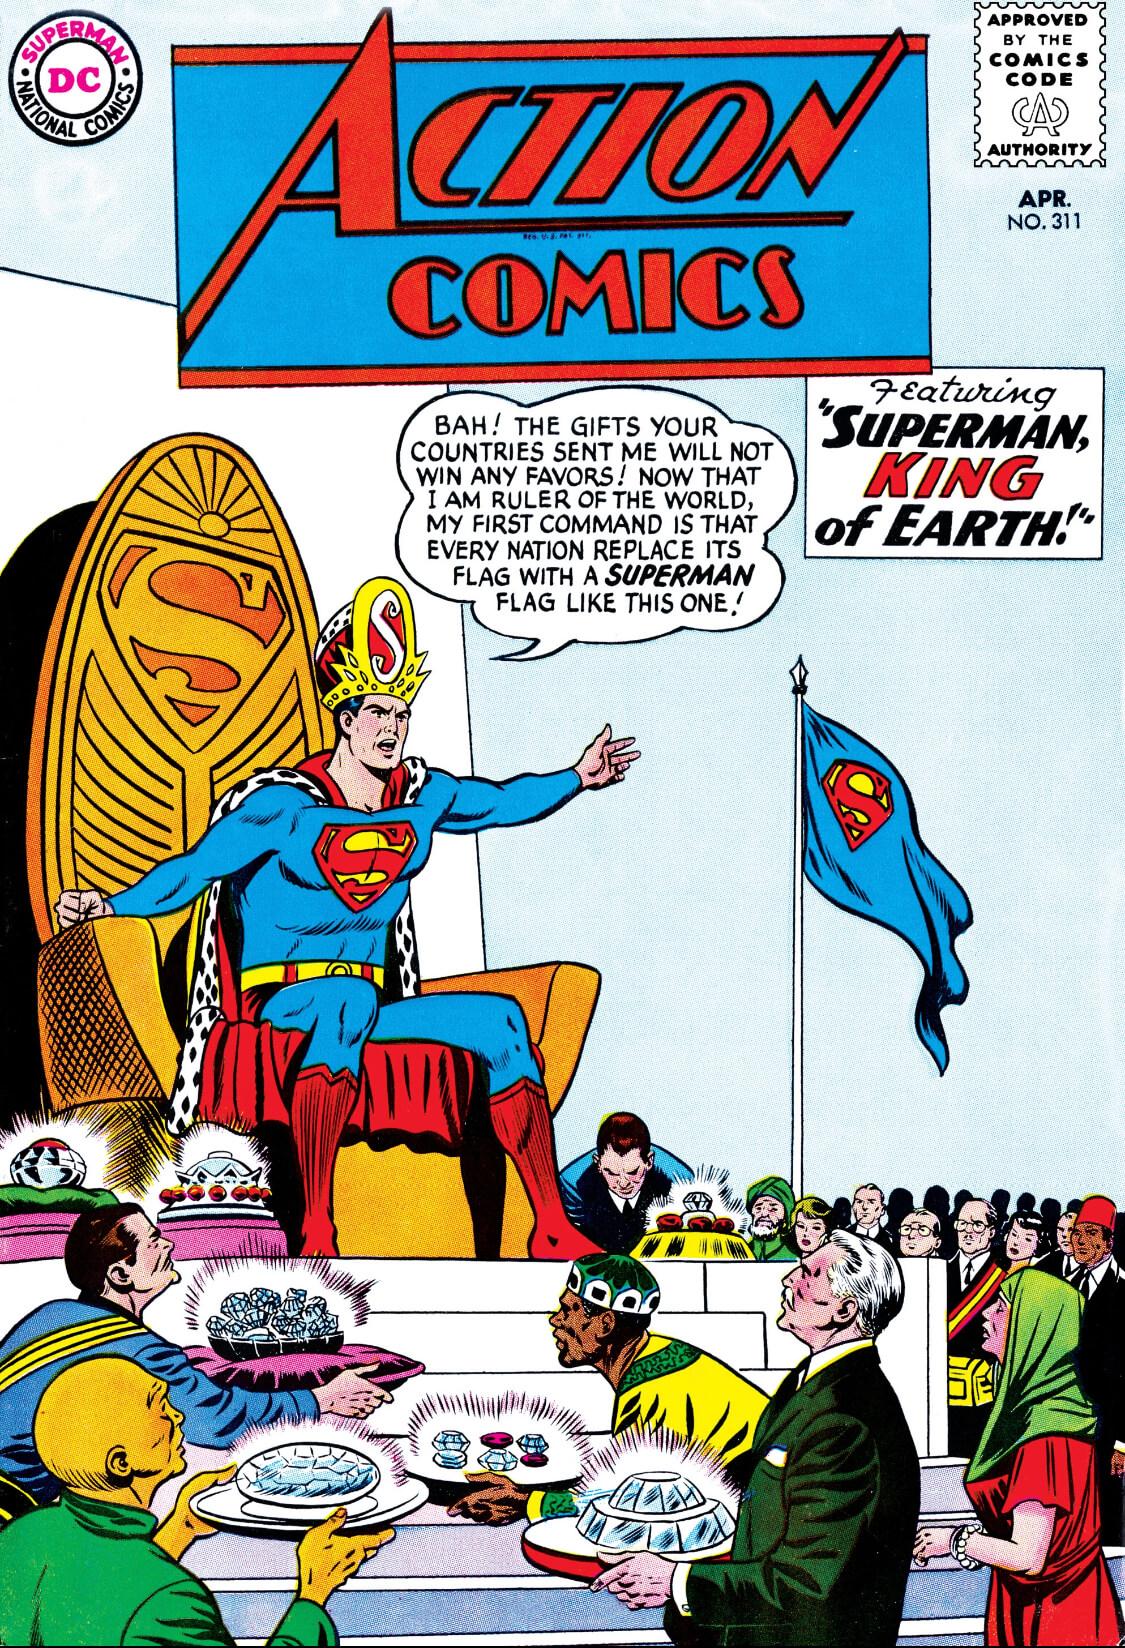 superman-pope-hat.jpg